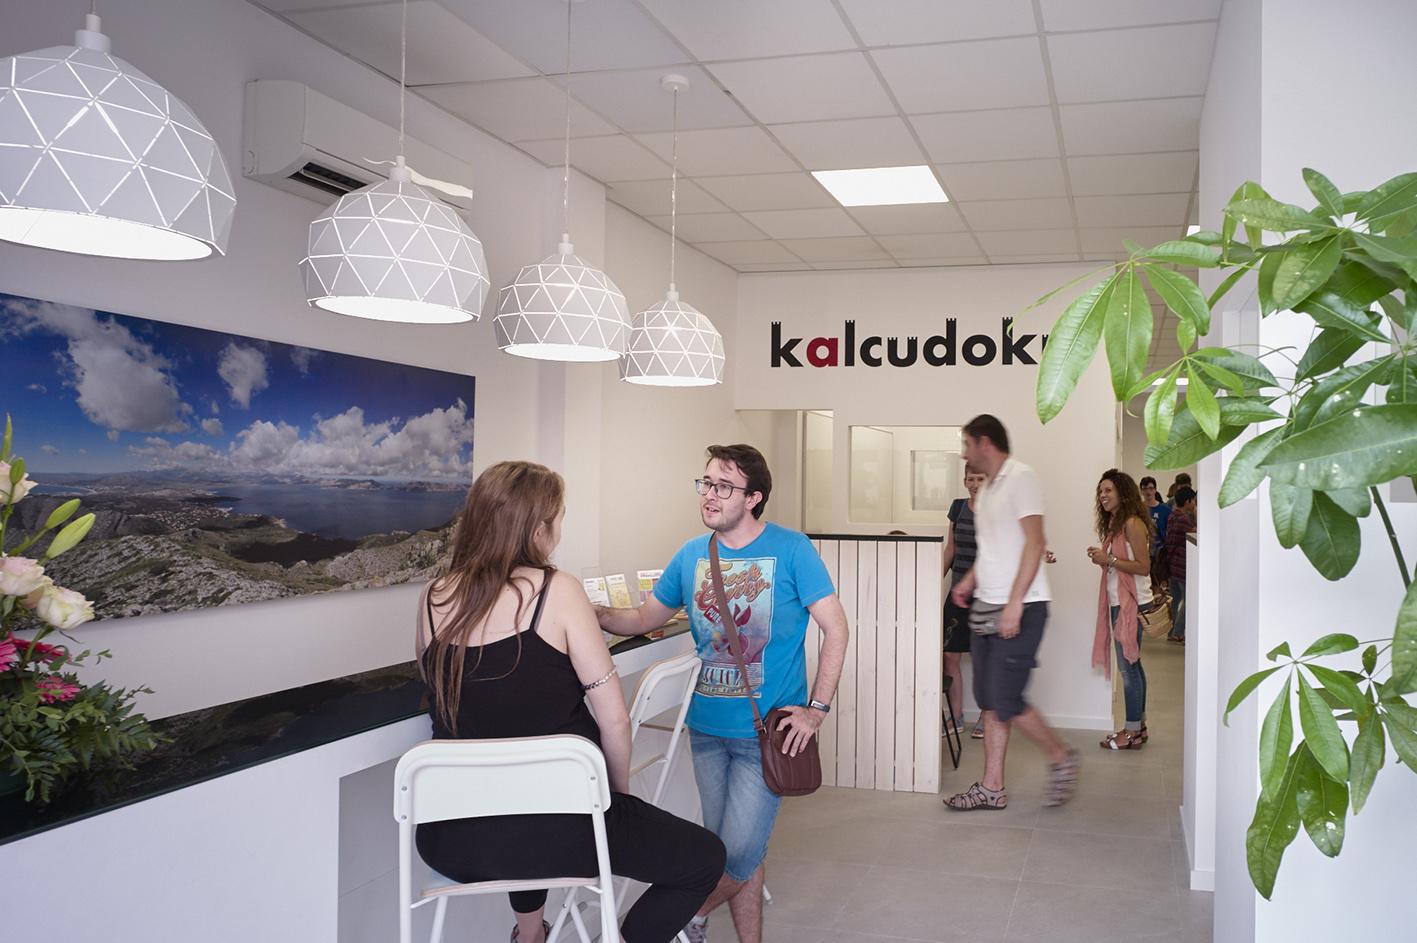 KALCUDOKU_L1000360.jpg